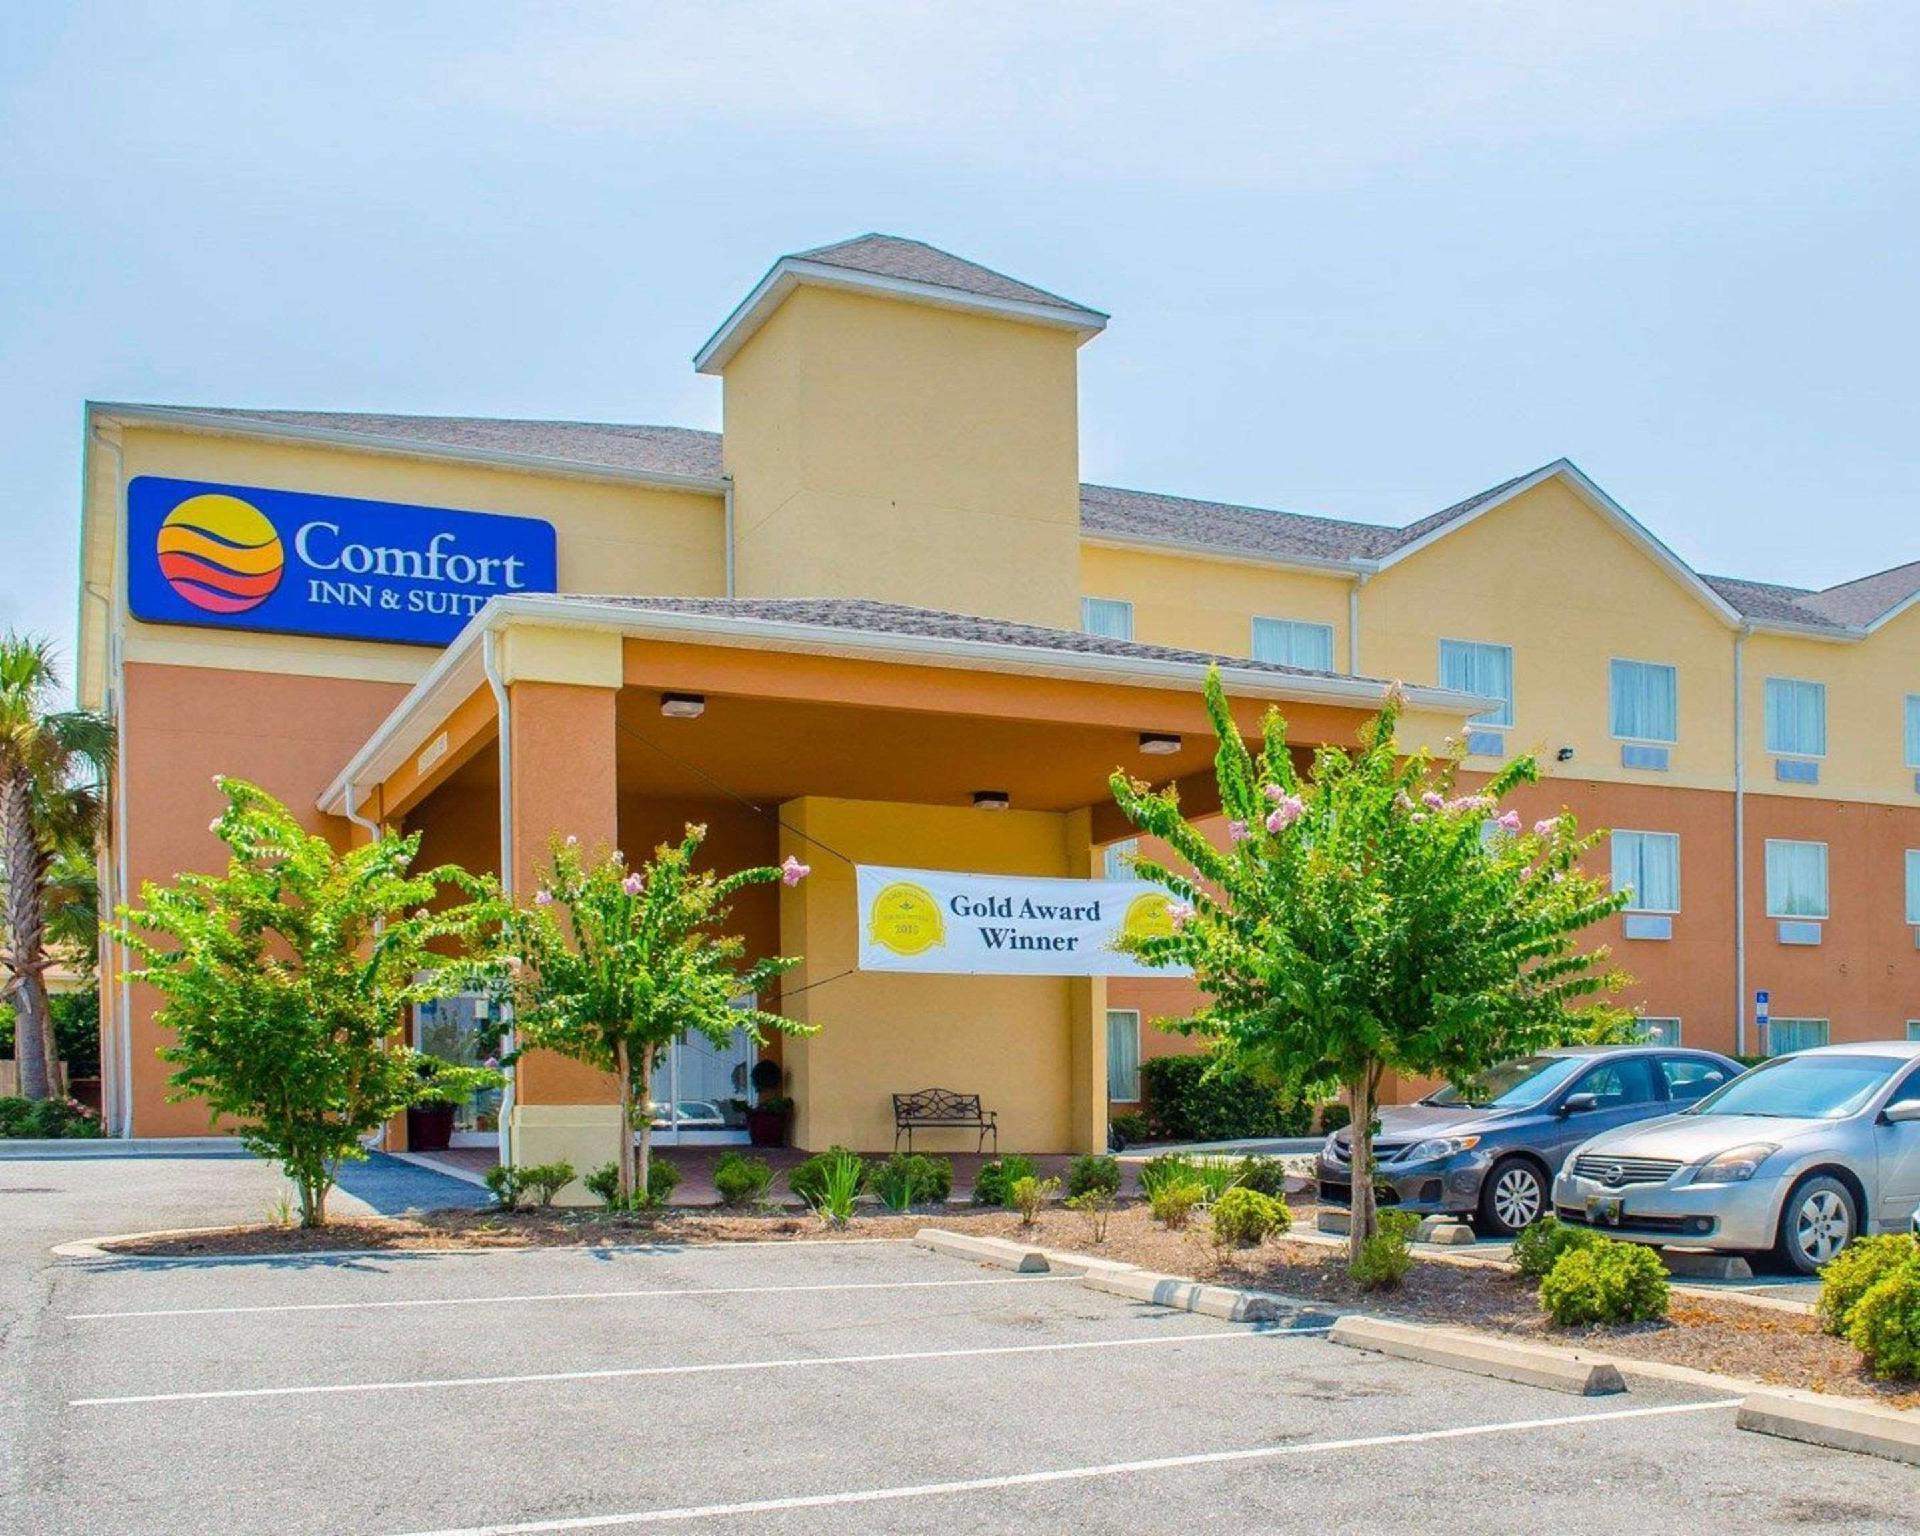 Comfort Inn And Suites Crestview